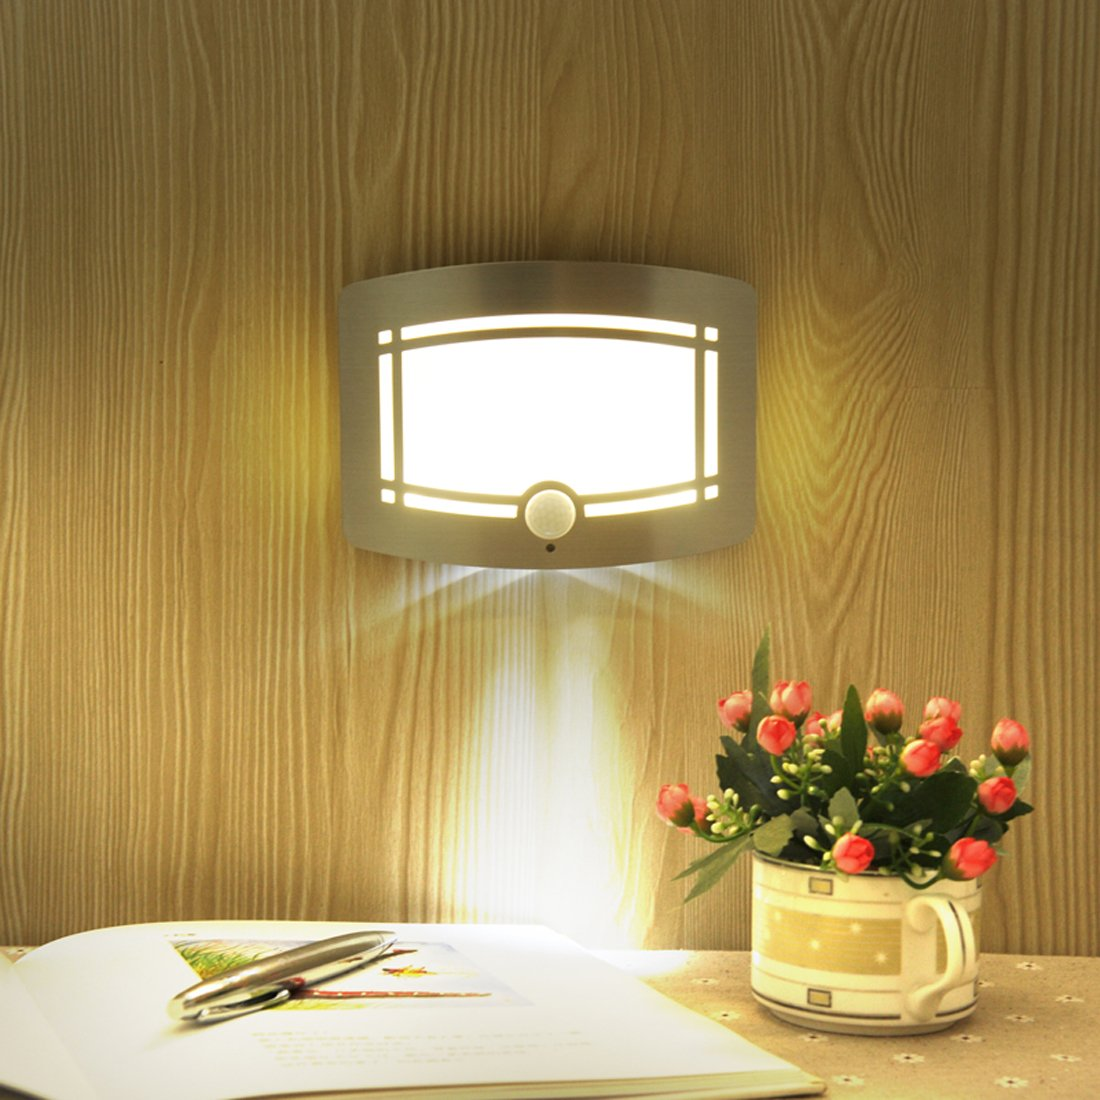 Motion Sensor LED Night Light,Wireless Battery Powered Wall Lamp,Stick Anywhere Wall Sconce,Aluminum Case Closet Light,Safe Light for Stair, Hallway,Bathrom,Bedroom,Kitchen by Kalefu (Image #2)